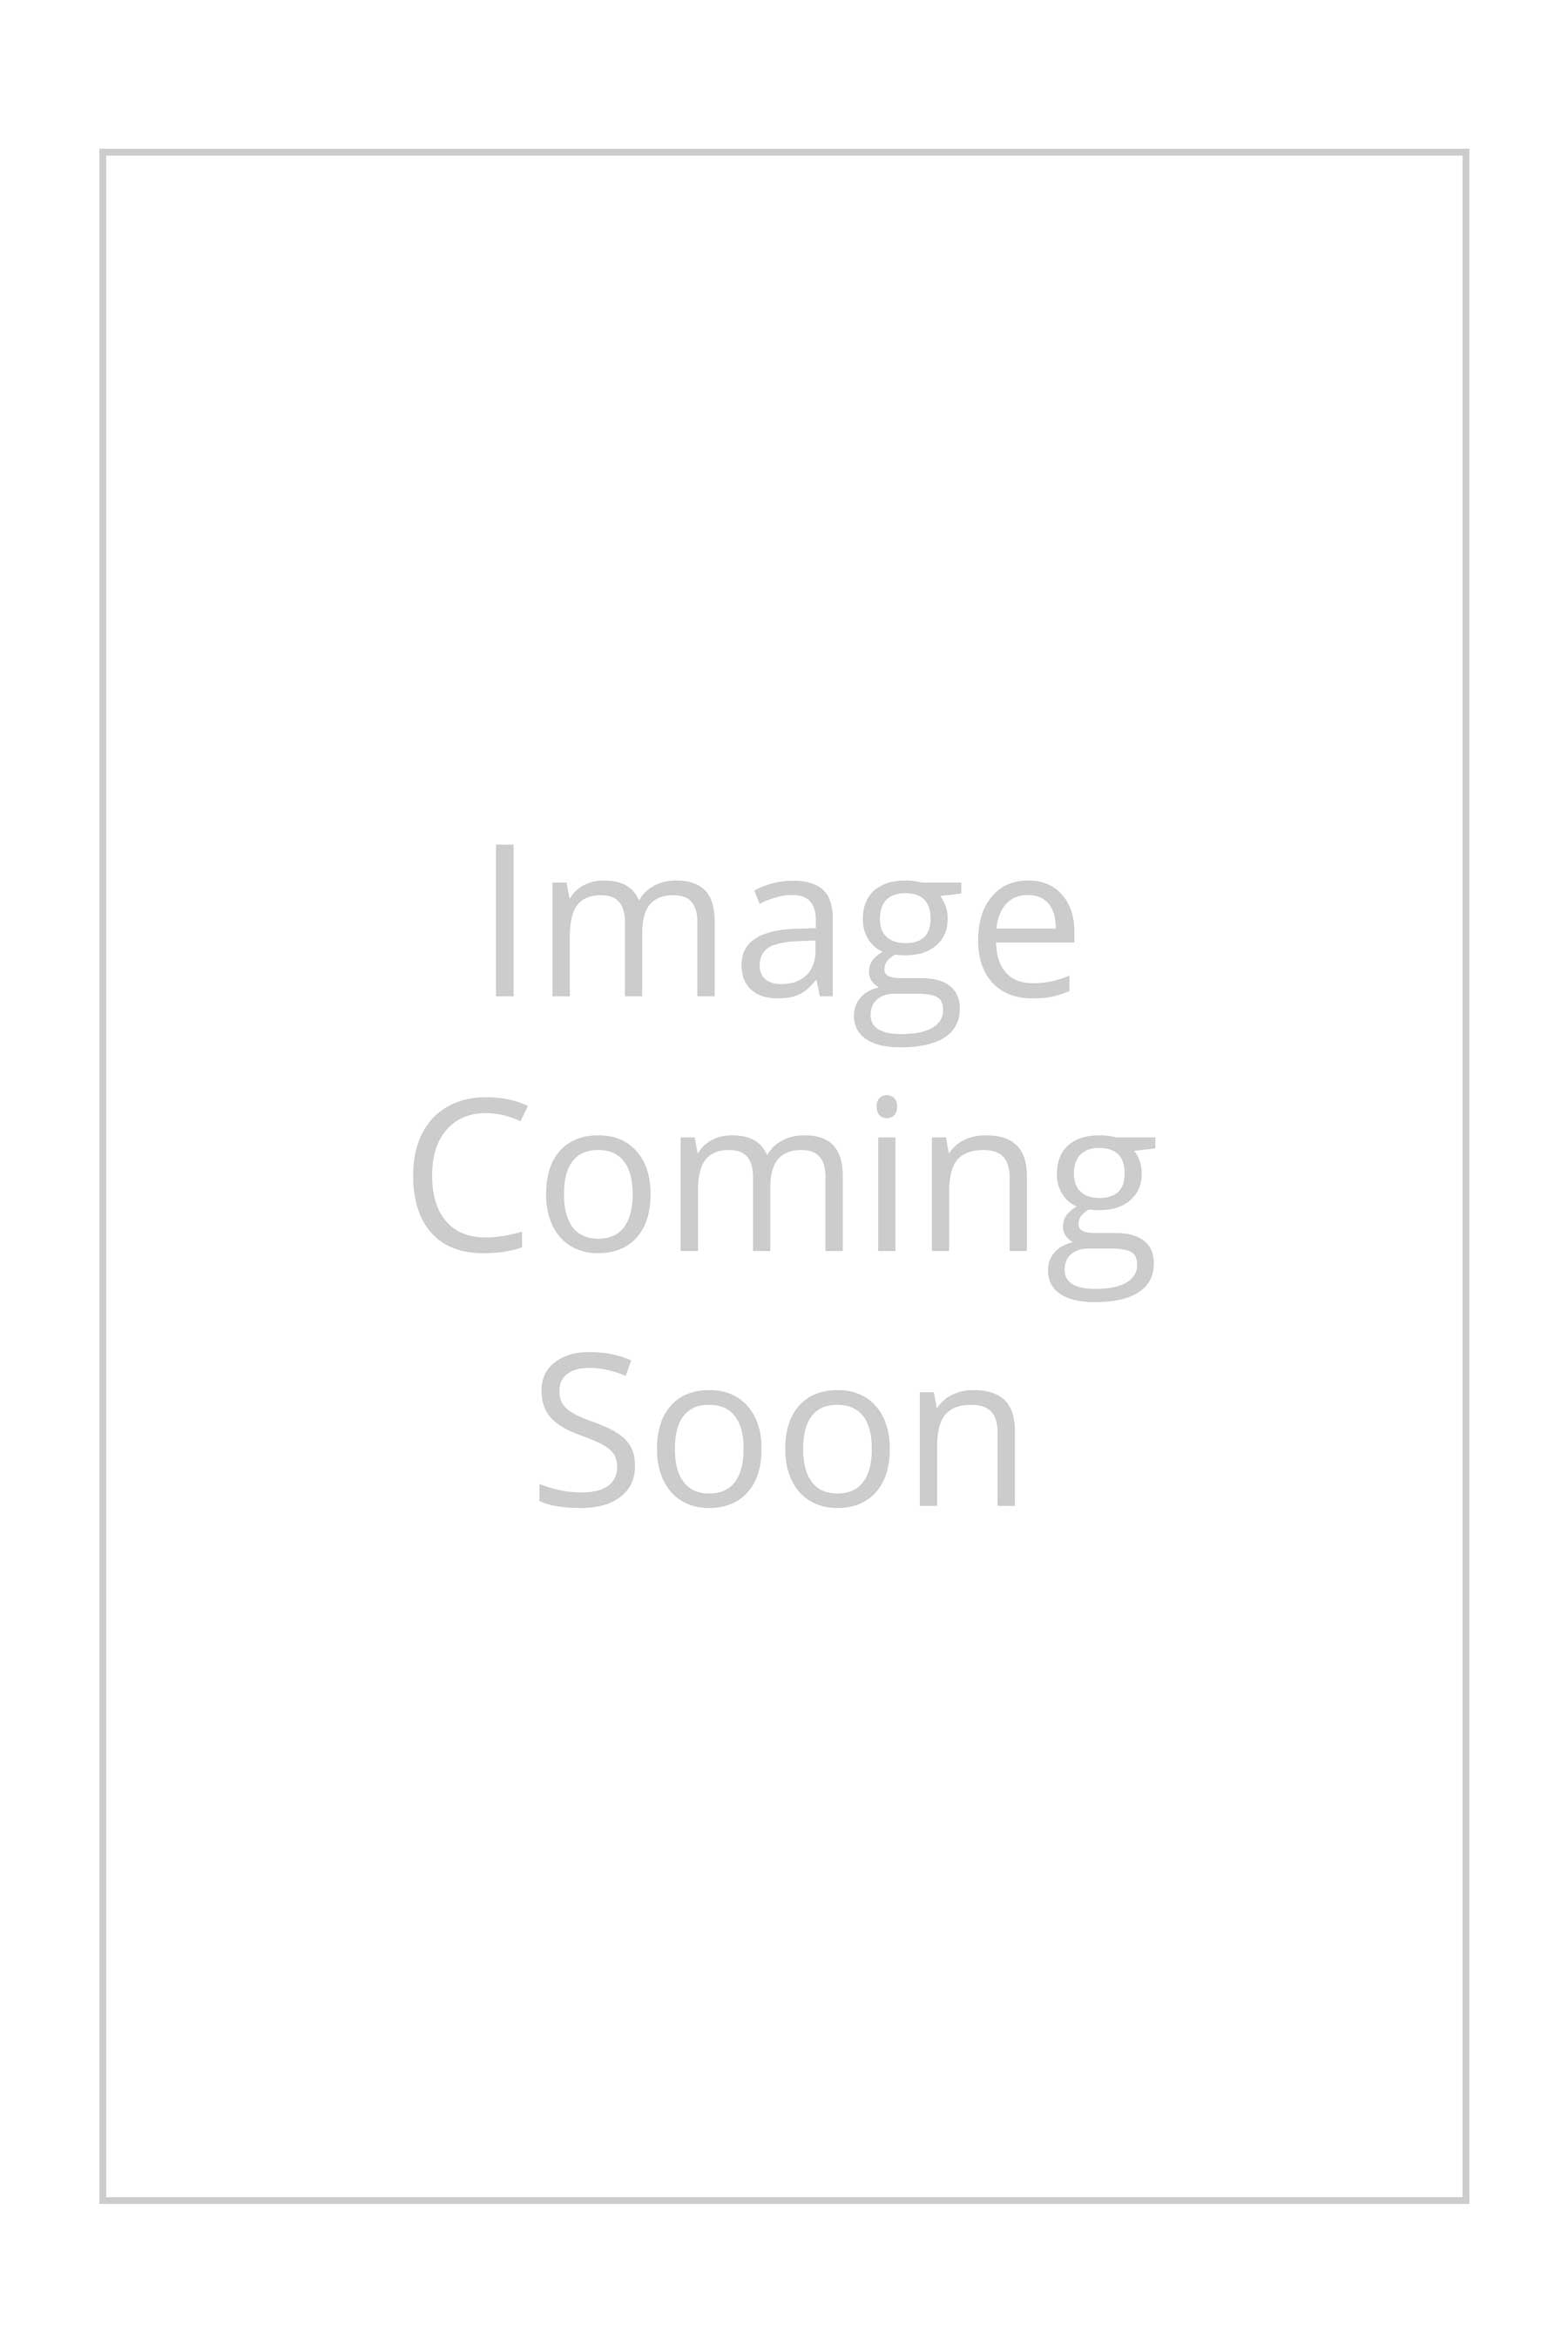 Vintage St John Navy Santana Knit Dress w/ White Collar & Cuffs